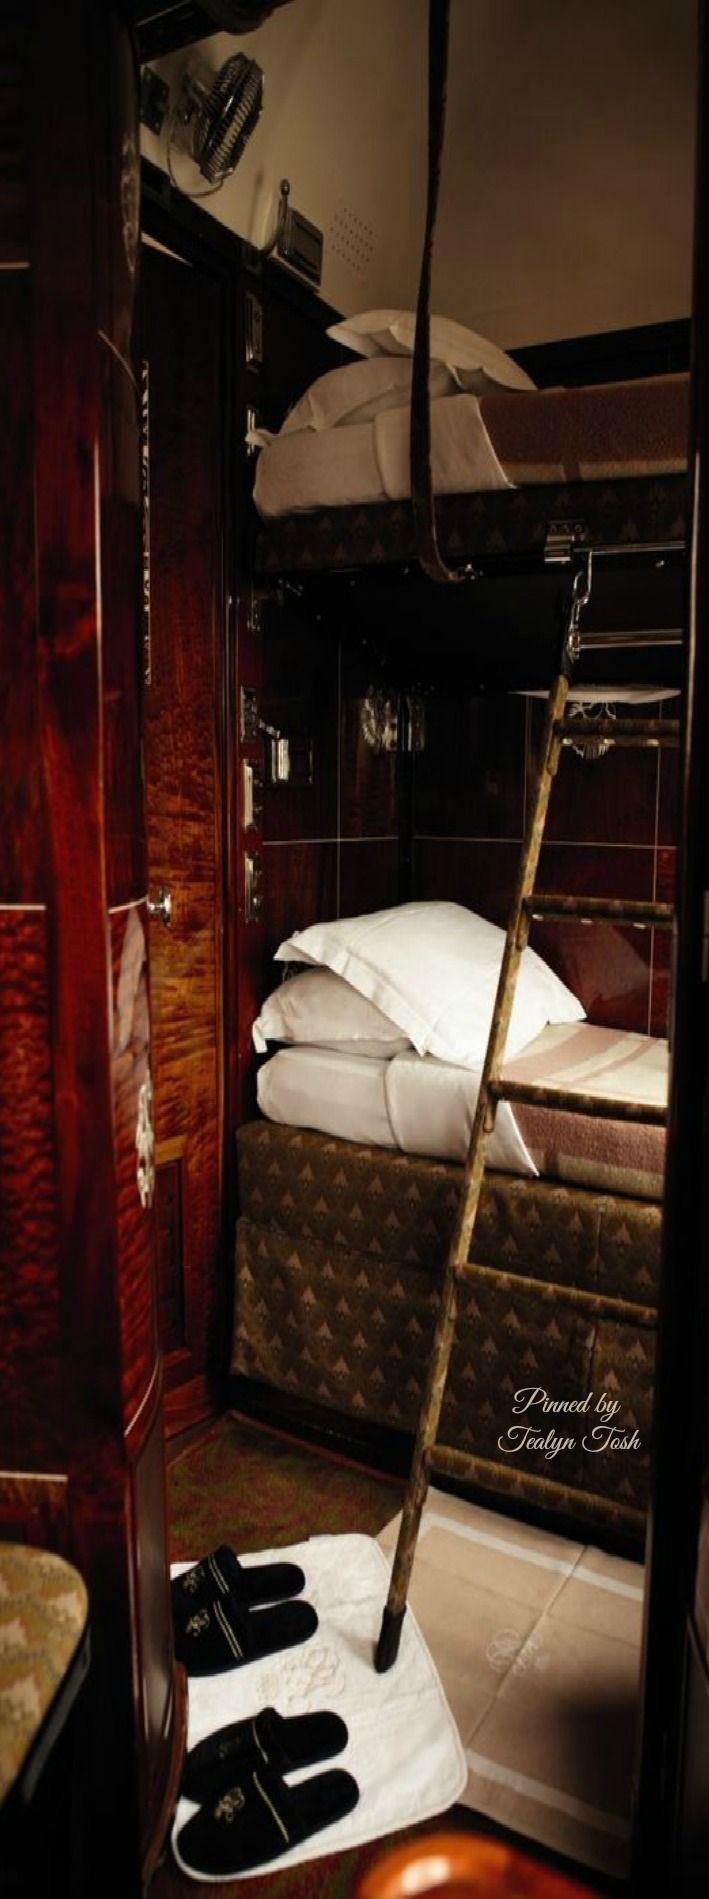 101 best somewhere in time images on pinterest bon voyage suitcases and antique books. Black Bedroom Furniture Sets. Home Design Ideas